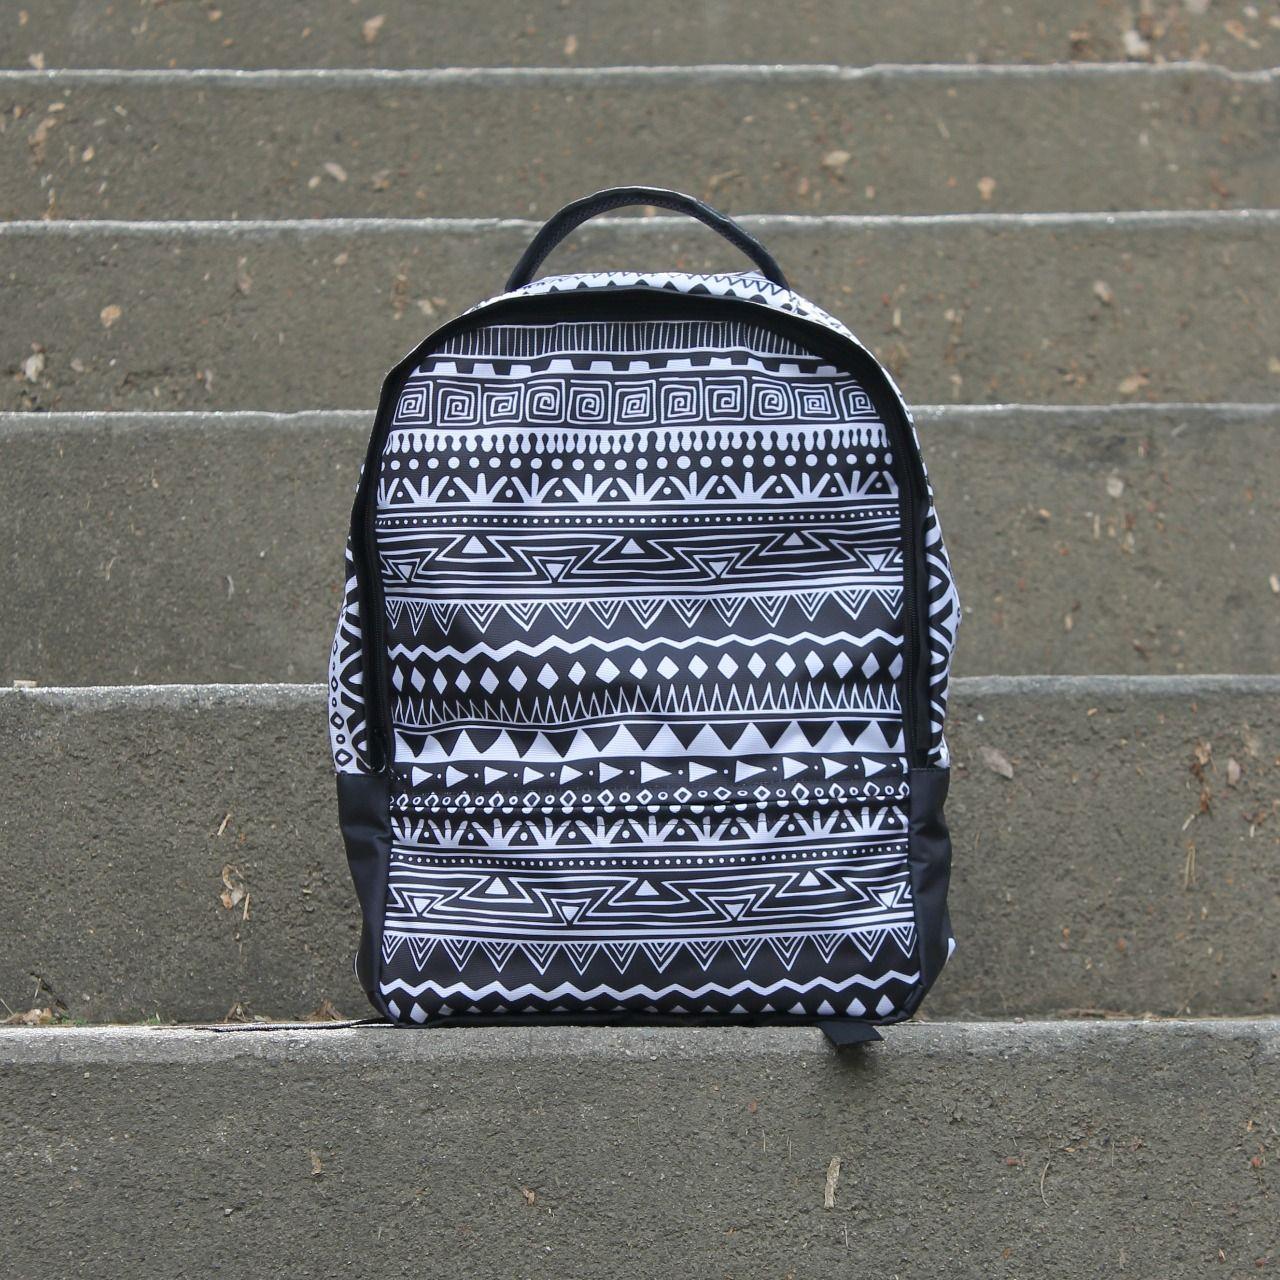 Morral étnico blanco y negro  Marca FULANO Bags, Morrales, mochilas, backpack, maletines.